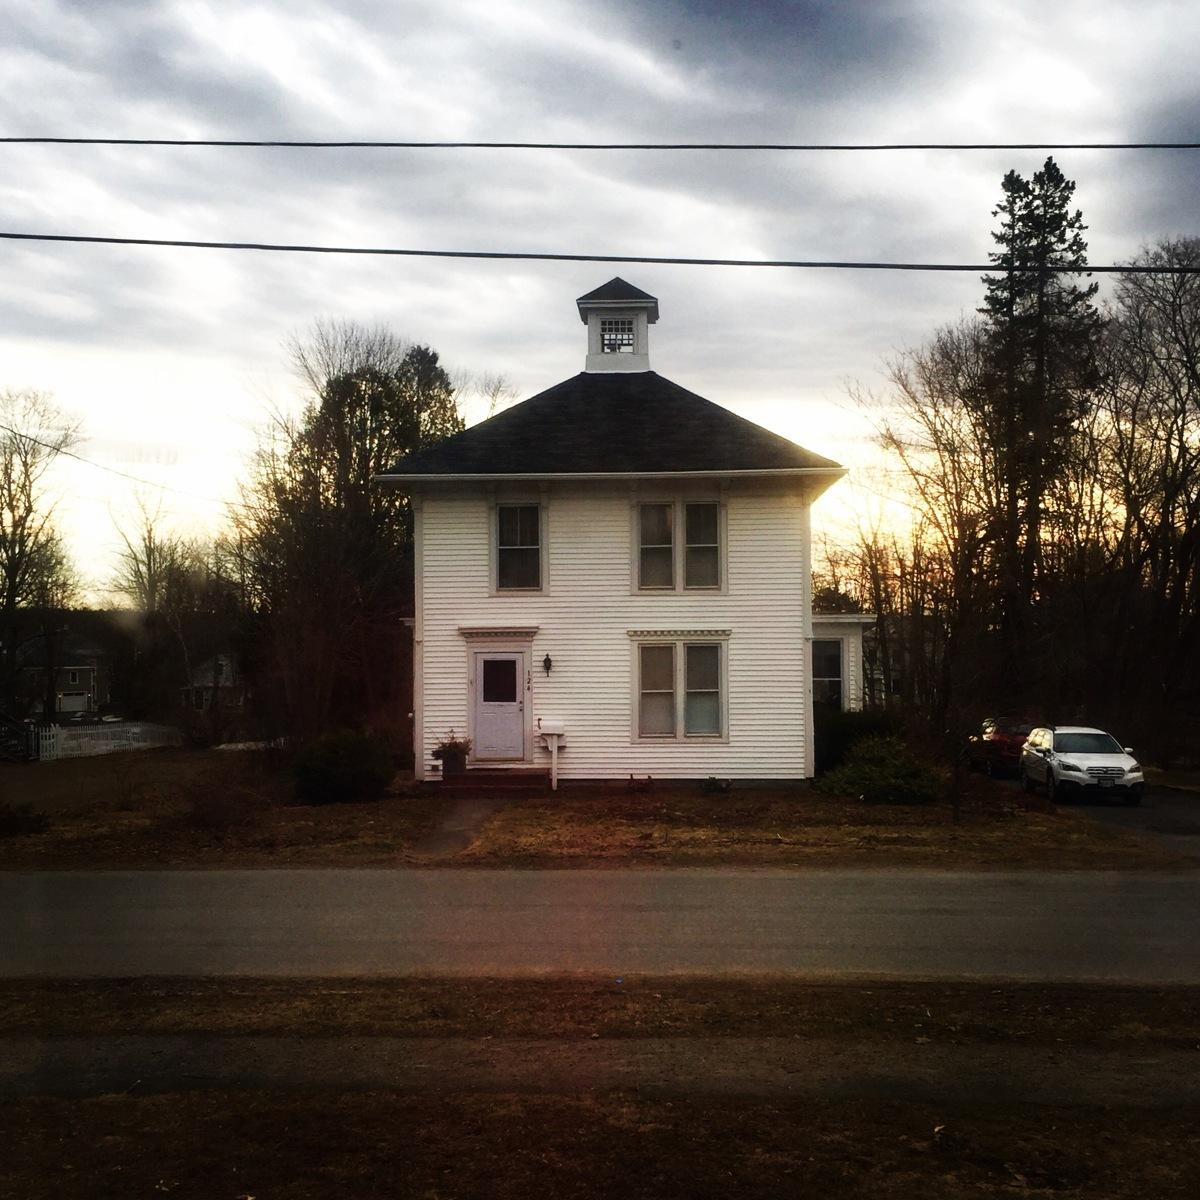 4.17 Sunrise grey sky white house (large view)